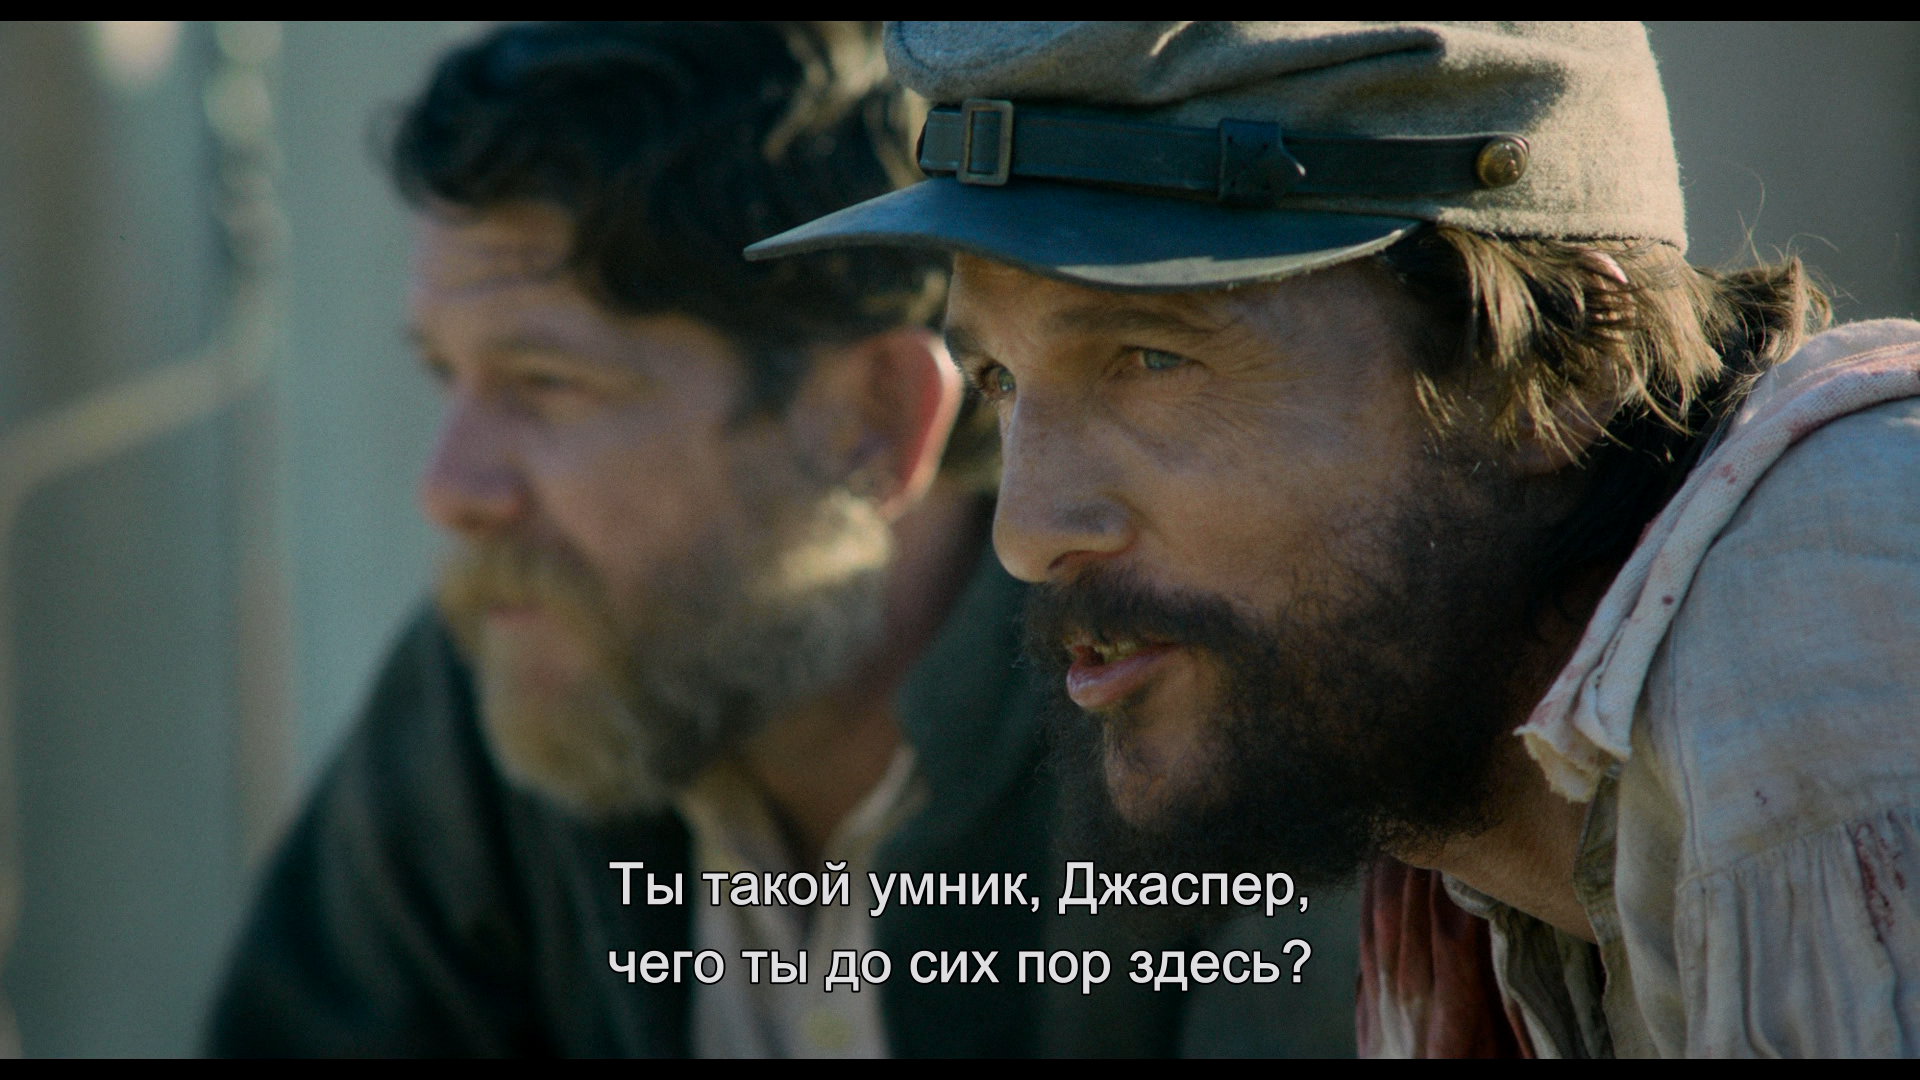 http://i4.imageban.ru/out/2016/12/28/f4c33b88856df2c01ddfe46e4512a468.png